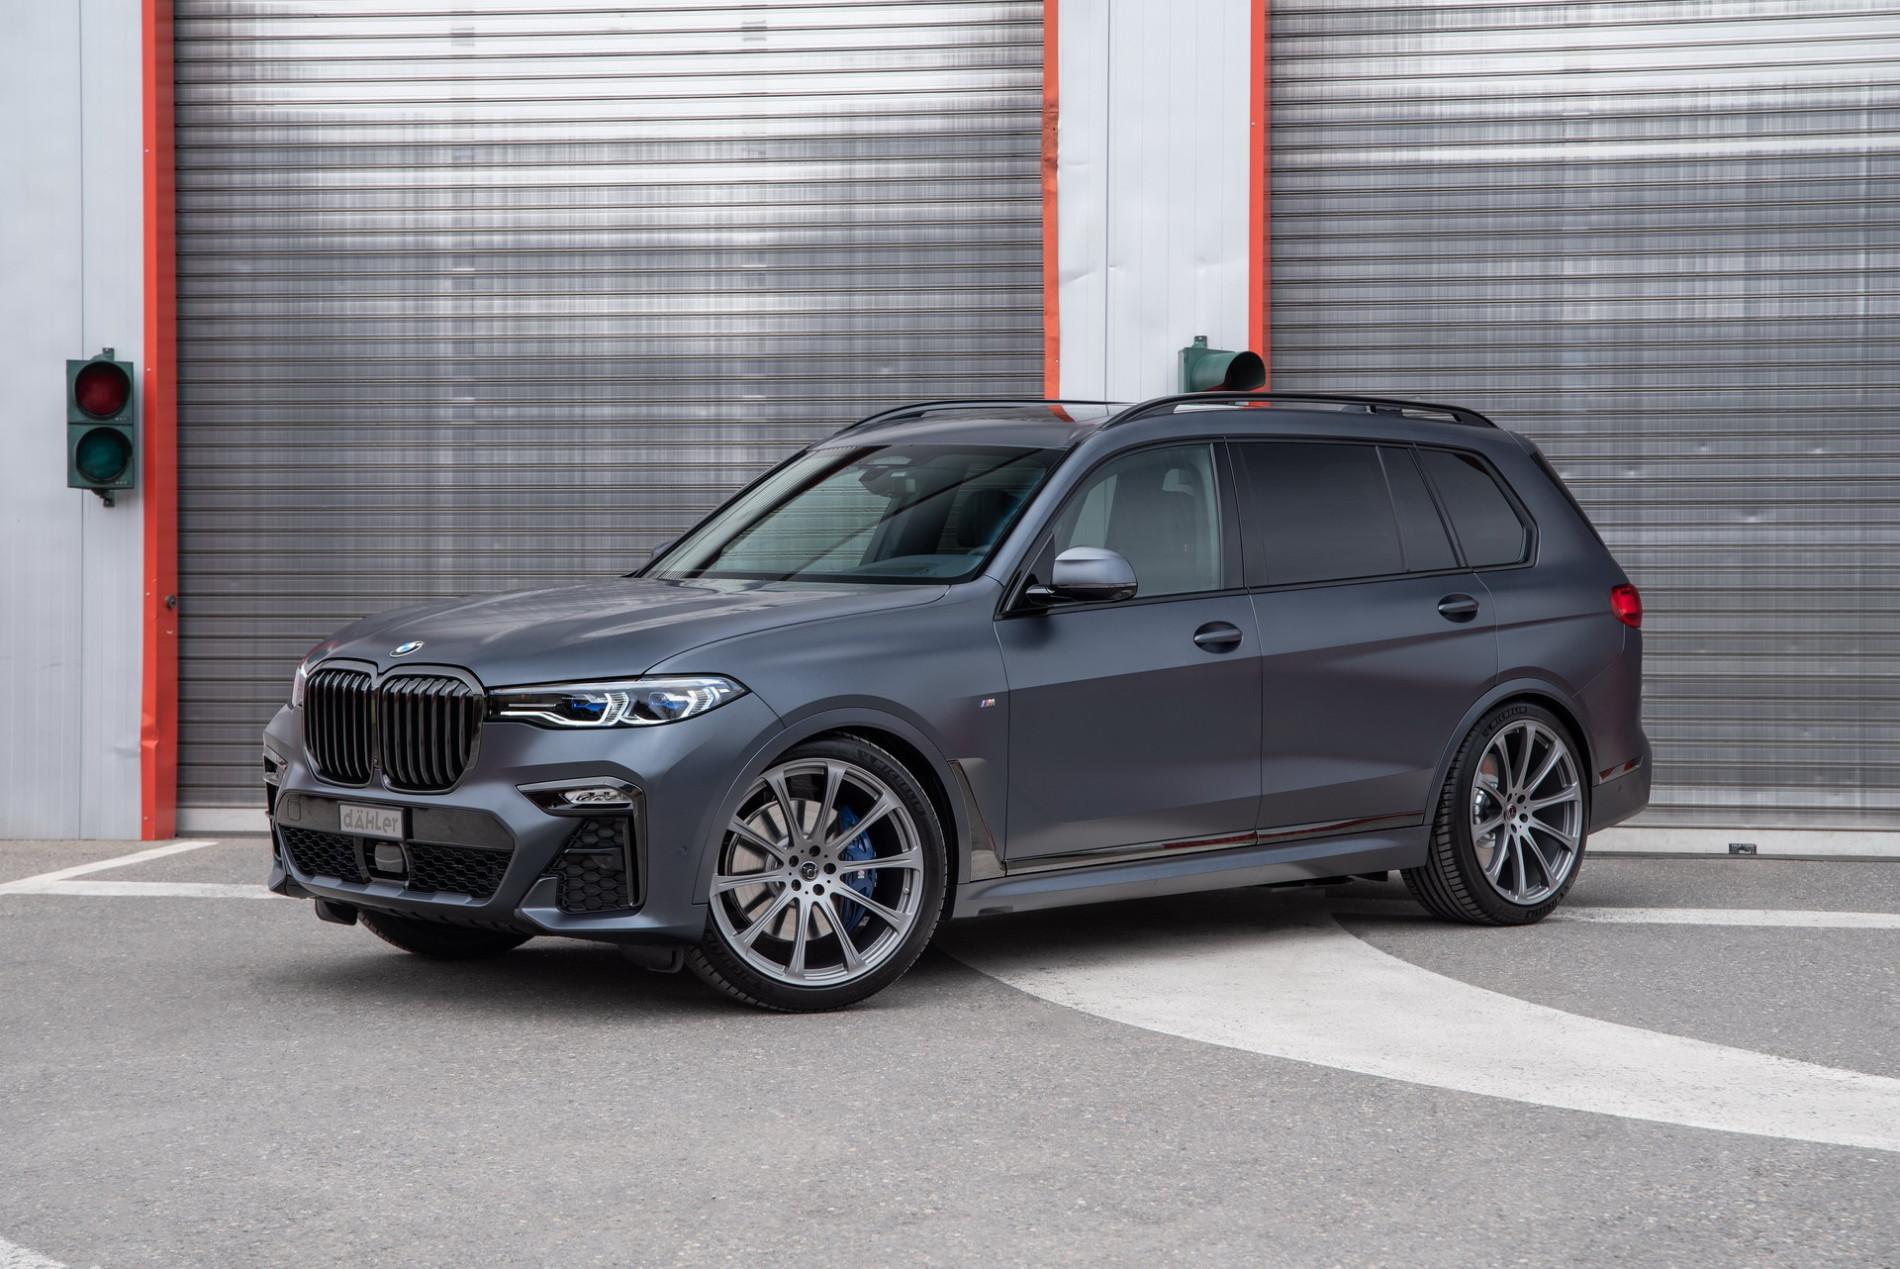 BMW X7 de la Dahler - BMW X7 de la Dahler